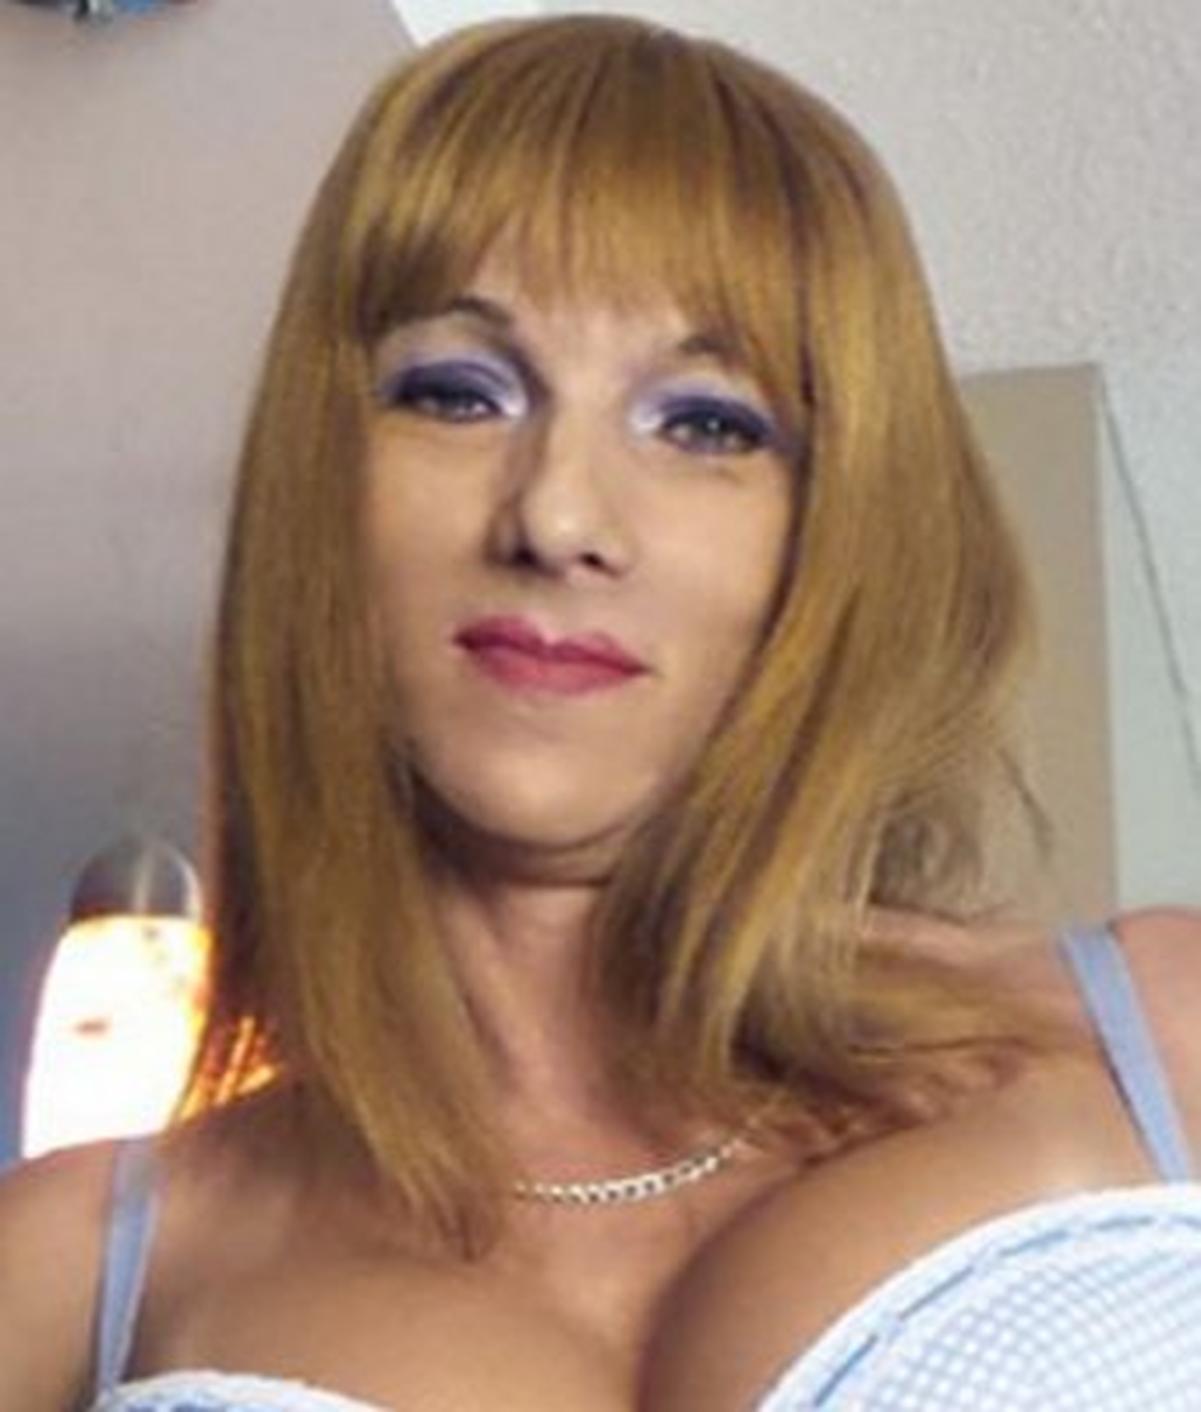 Alexis D'vyne